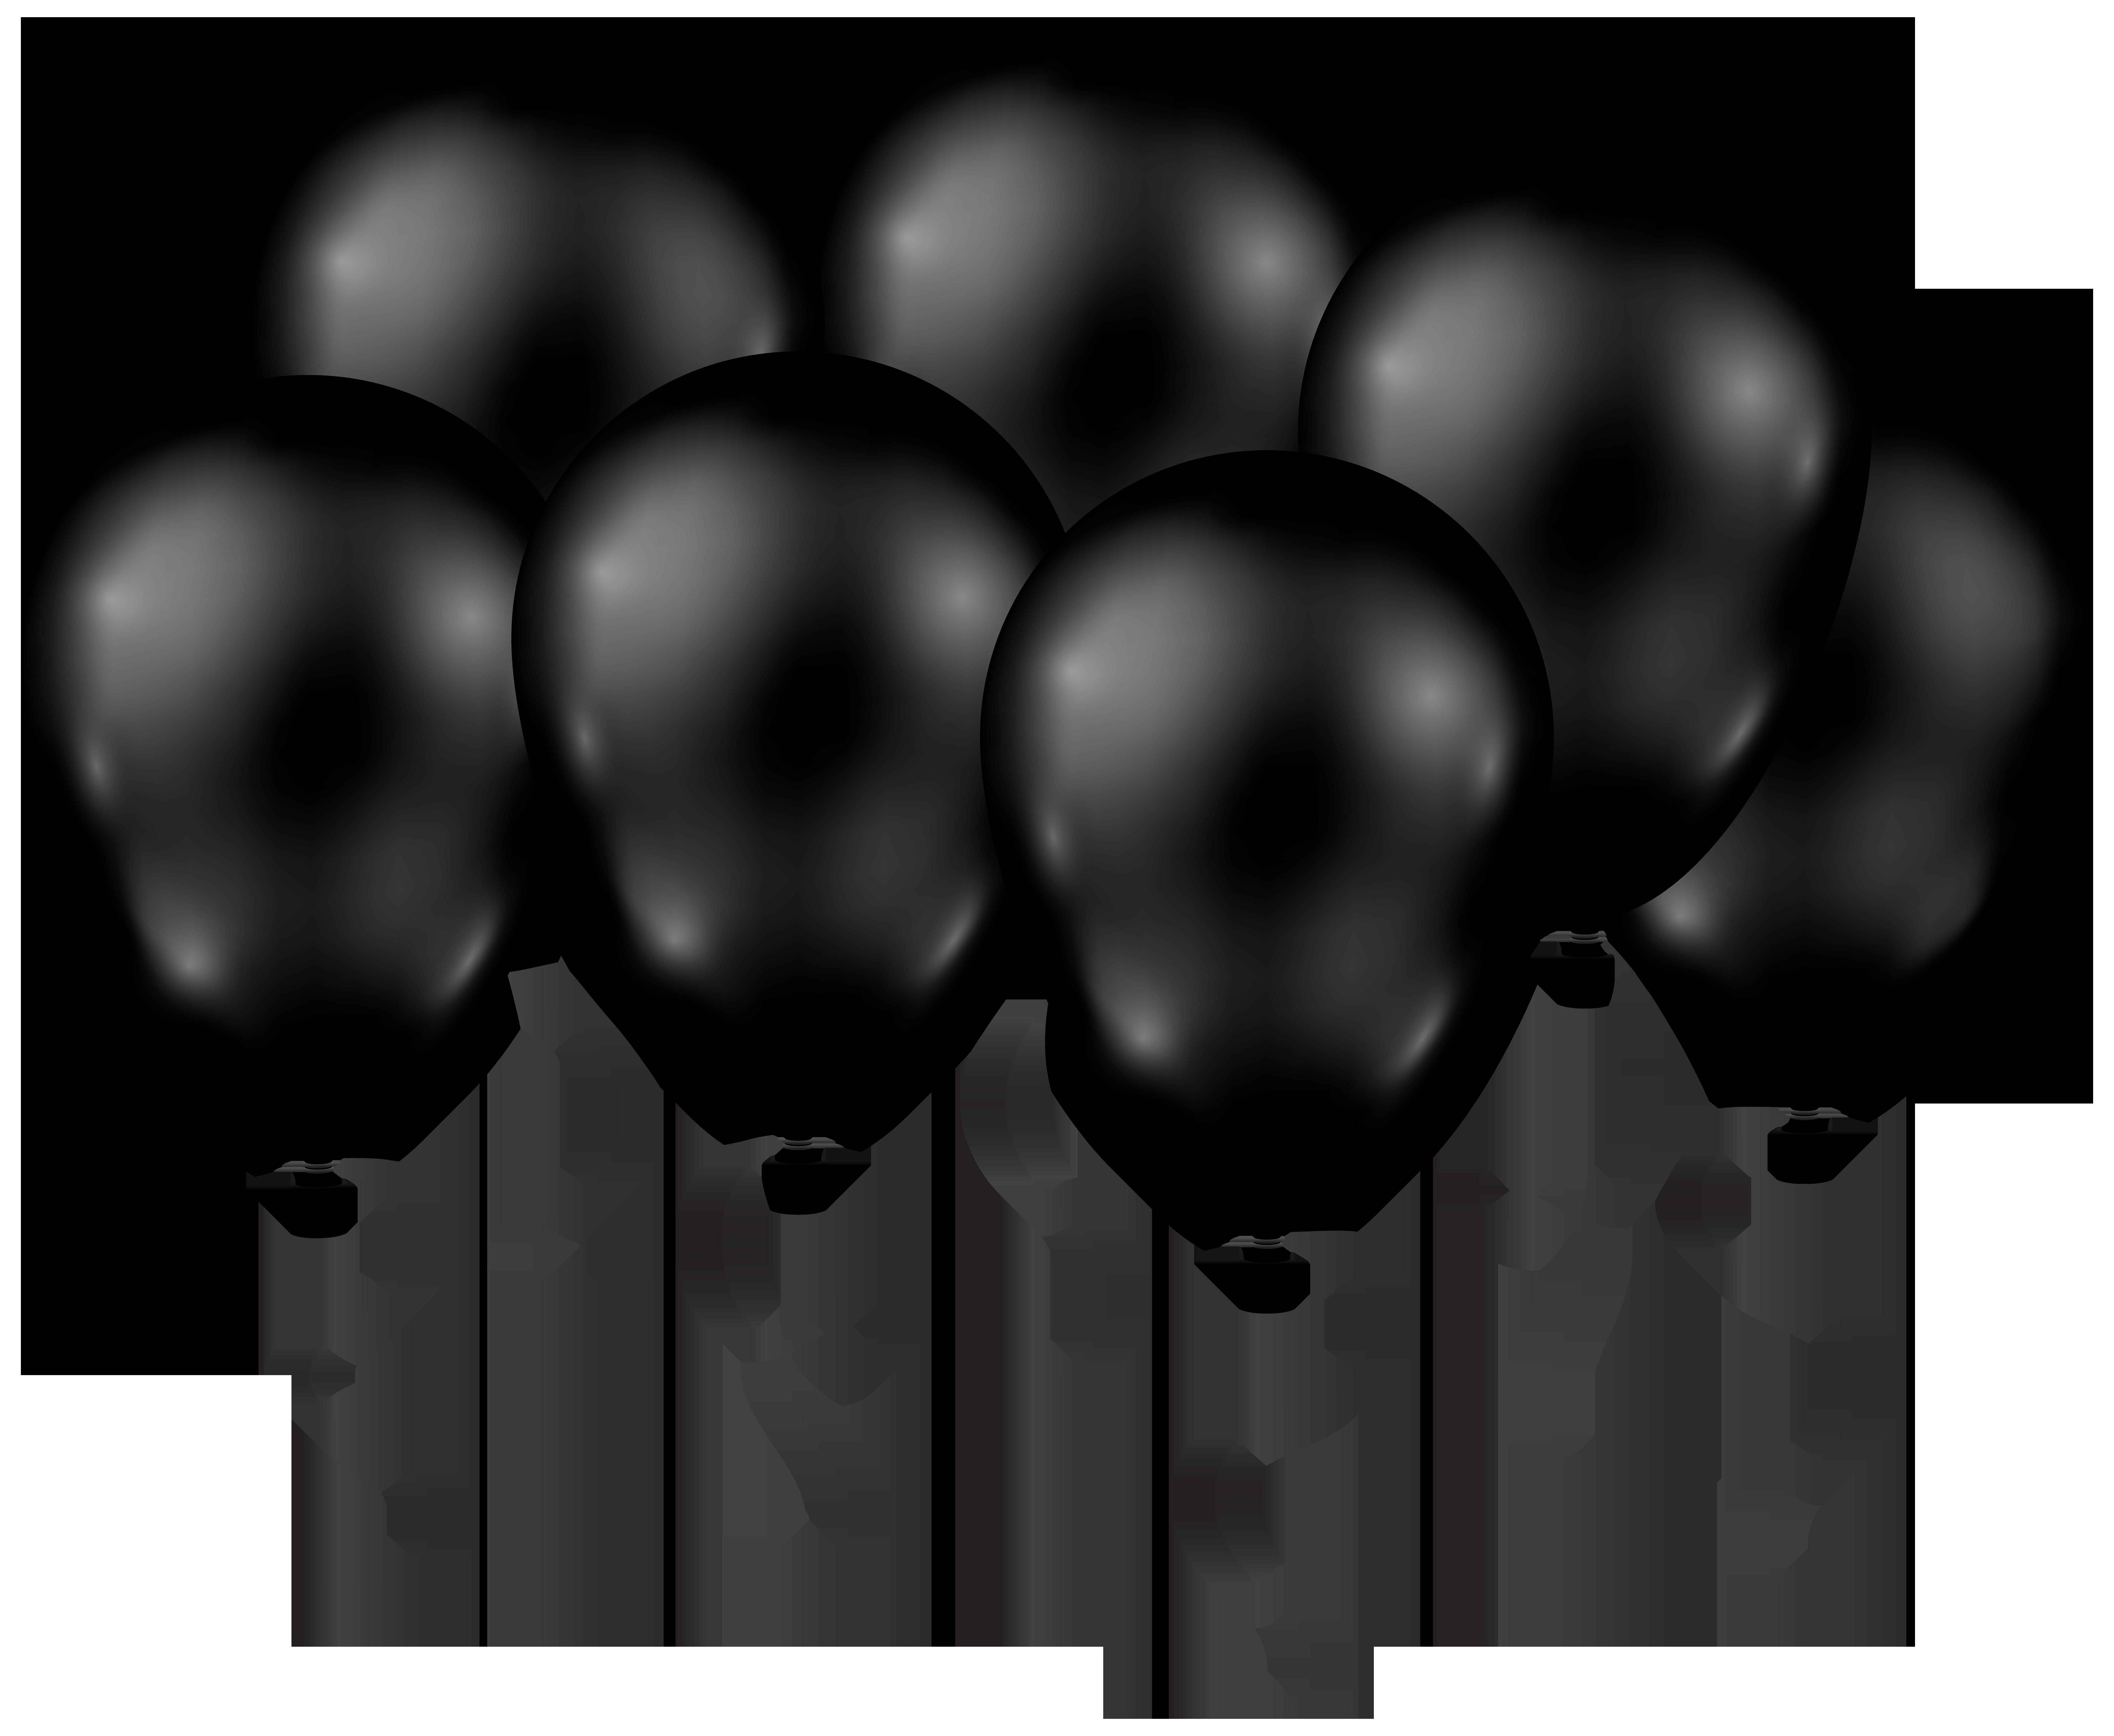 Black Balloons Transparent PNG Clip Art Image.